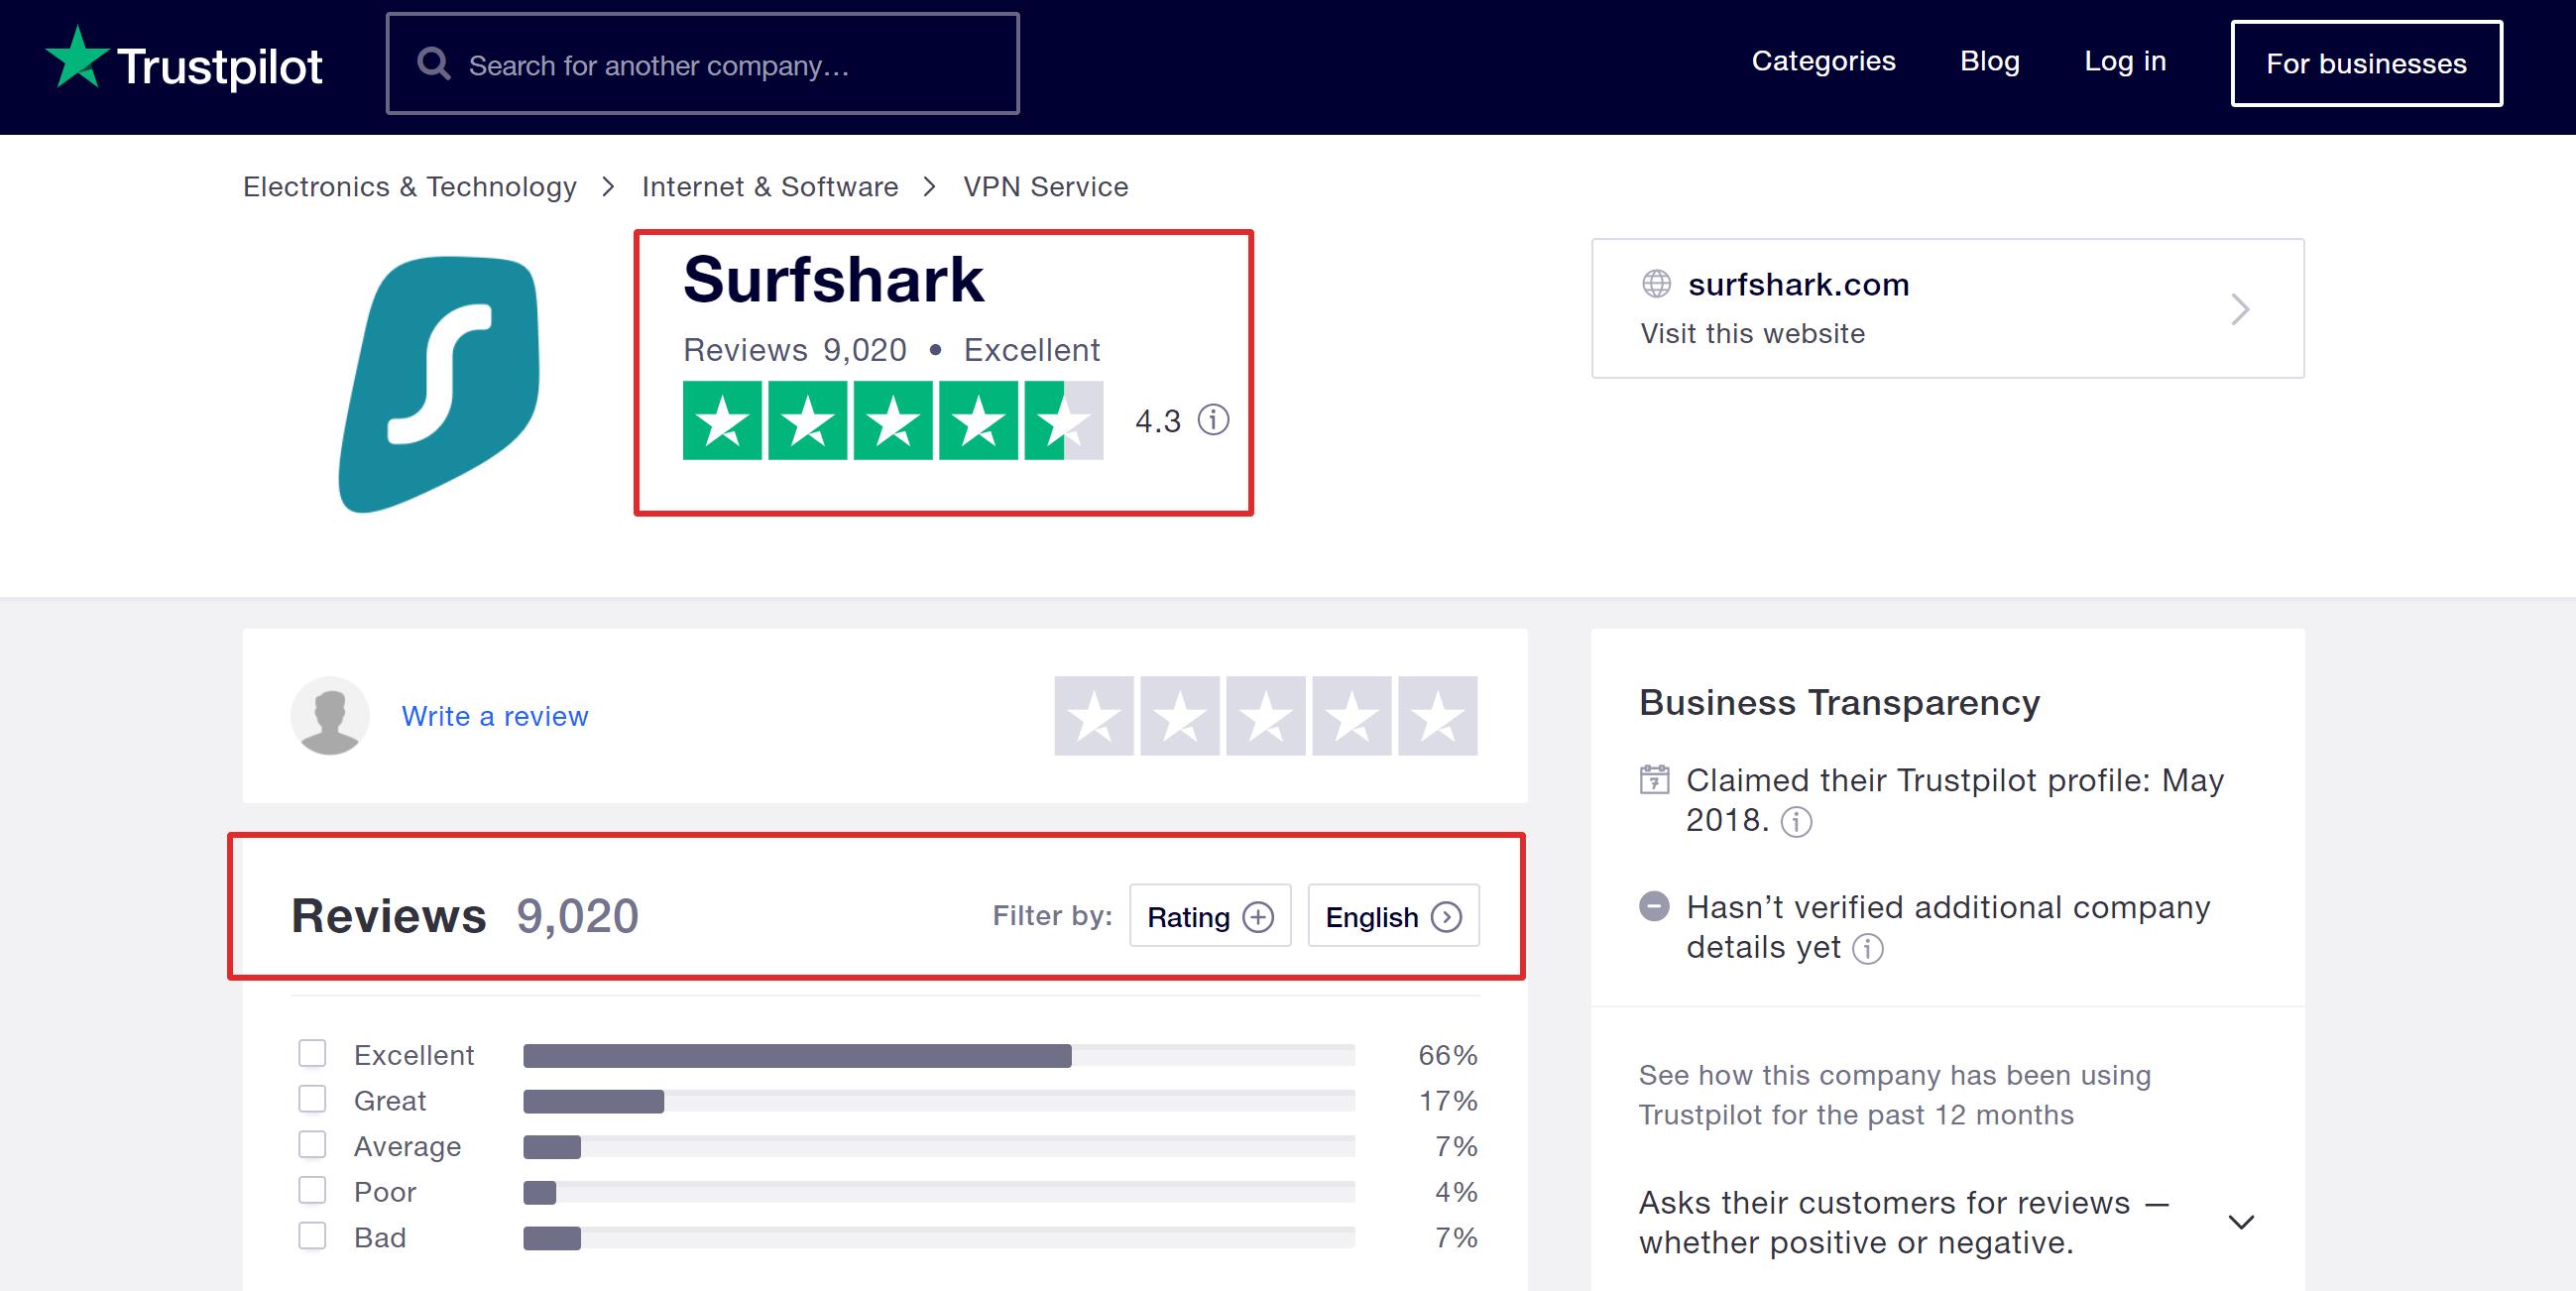 Surfshark Trustpilot Reviews